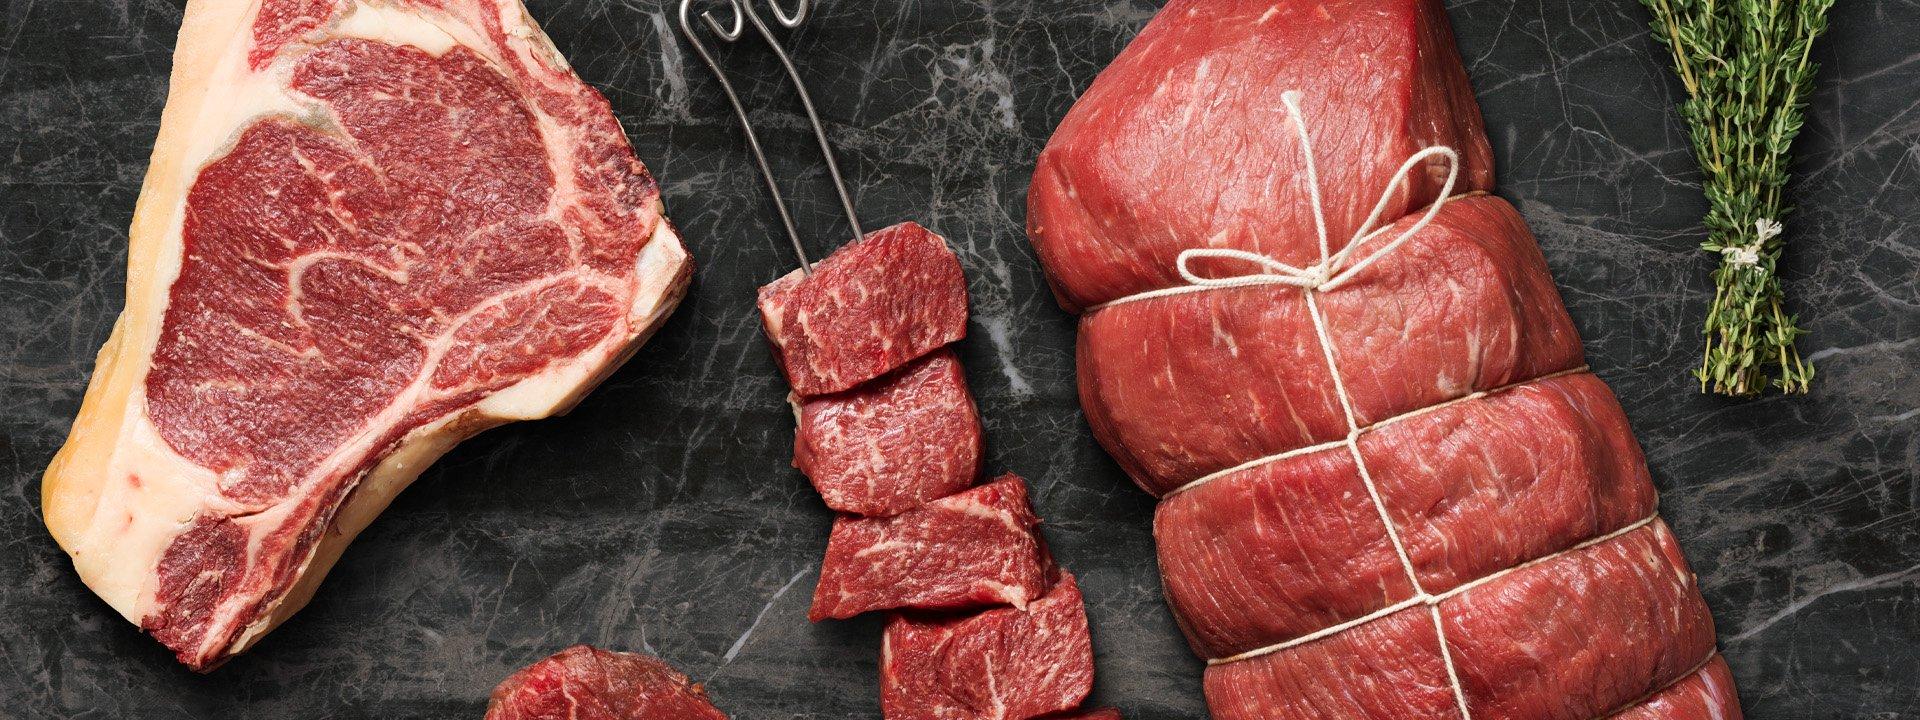 Olika sorters kött